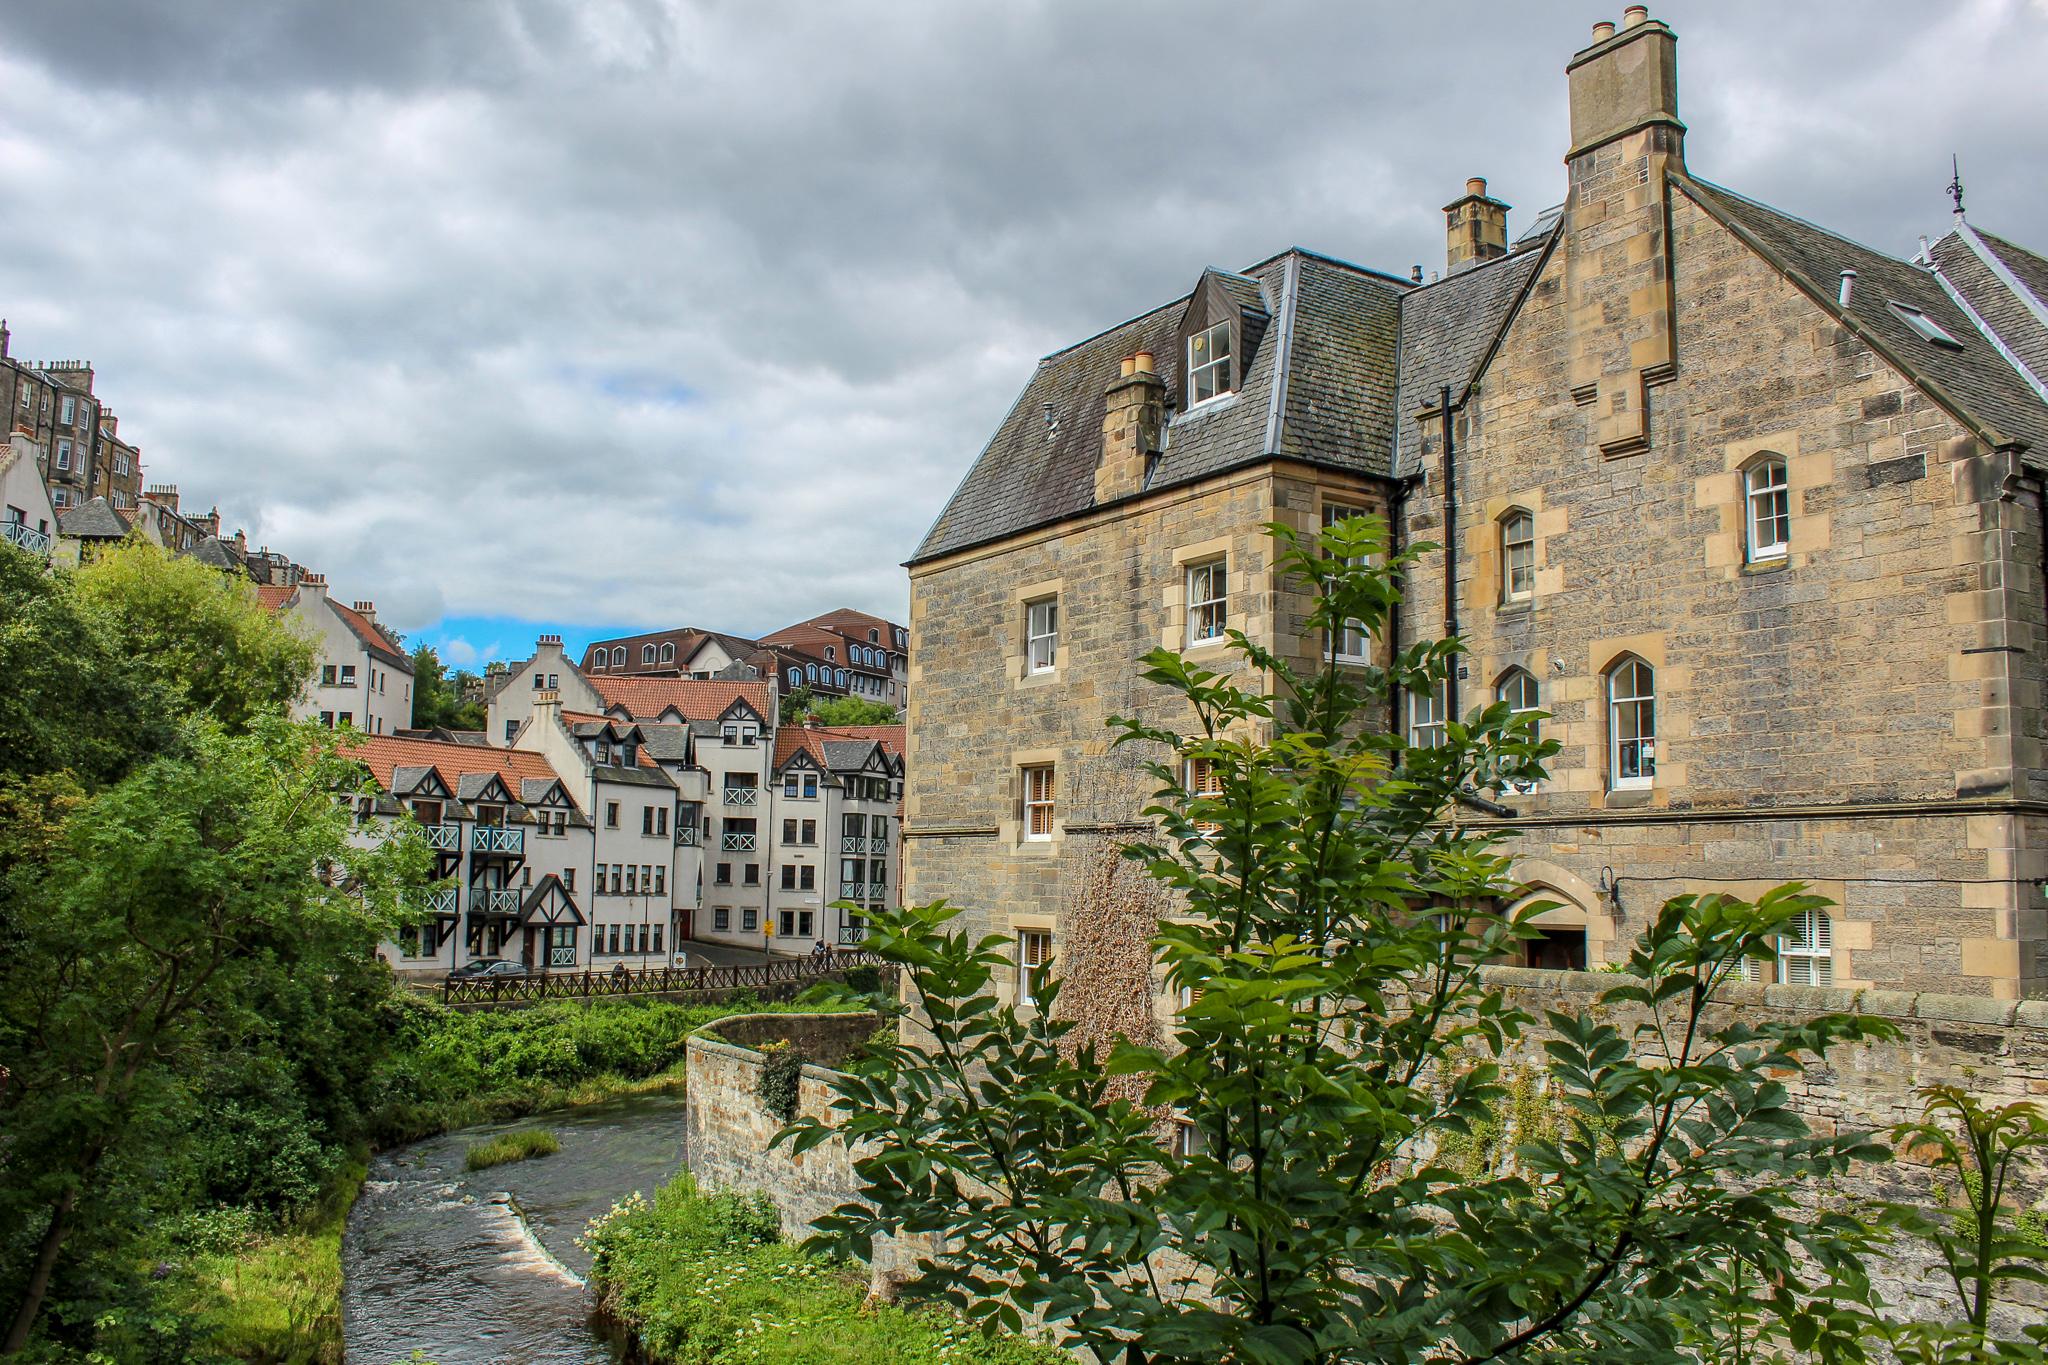 itinerary for edinburgh should include dean village